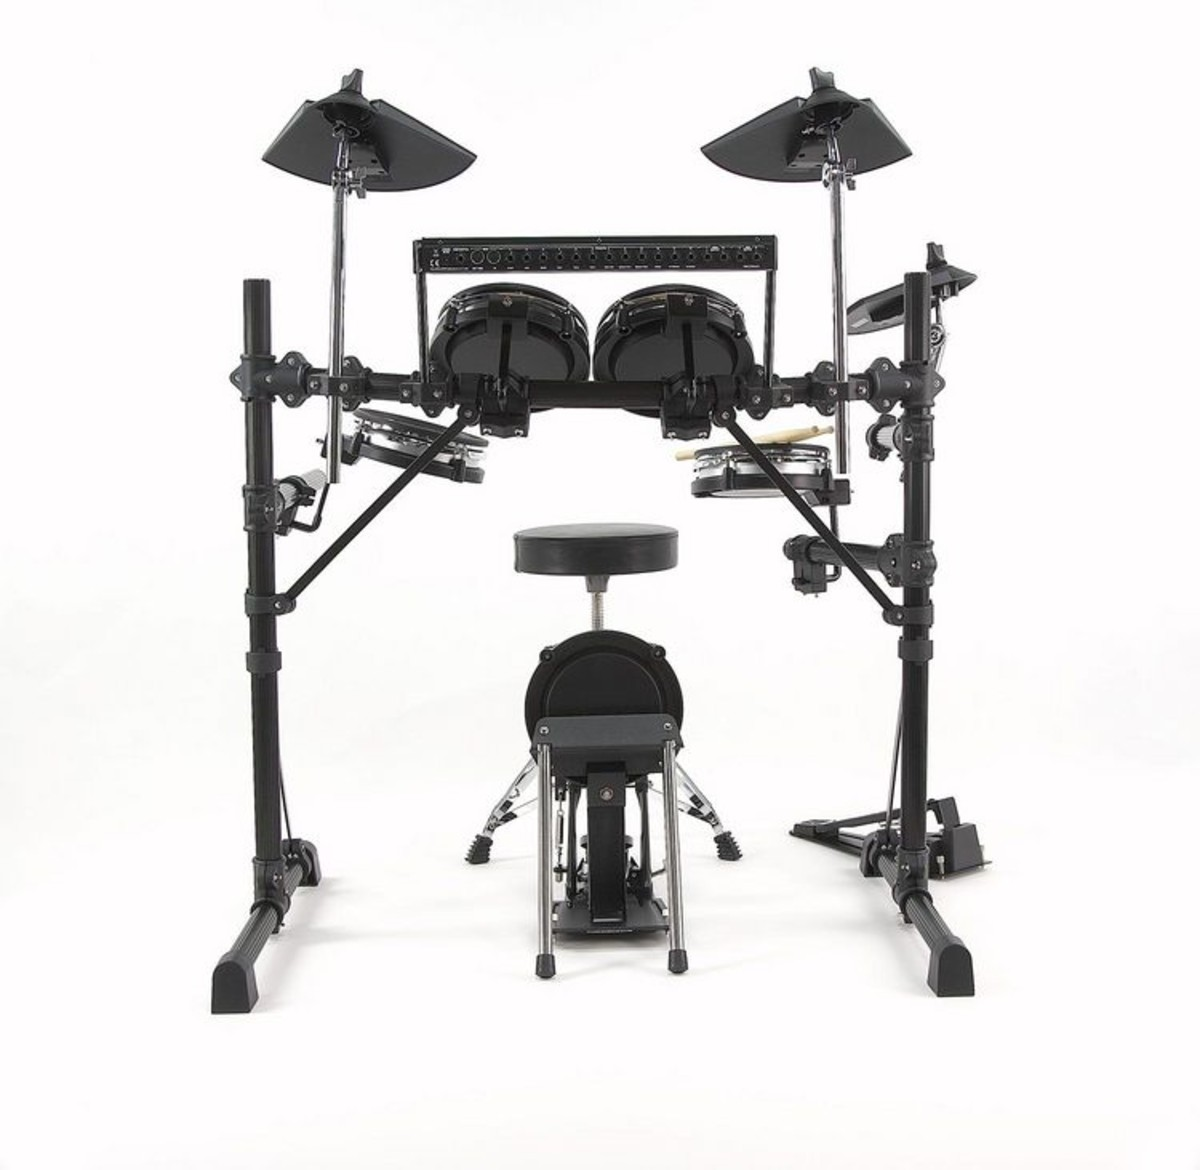 alesis dm5 pro drum kit amp package deal at gear4music. Black Bedroom Furniture Sets. Home Design Ideas